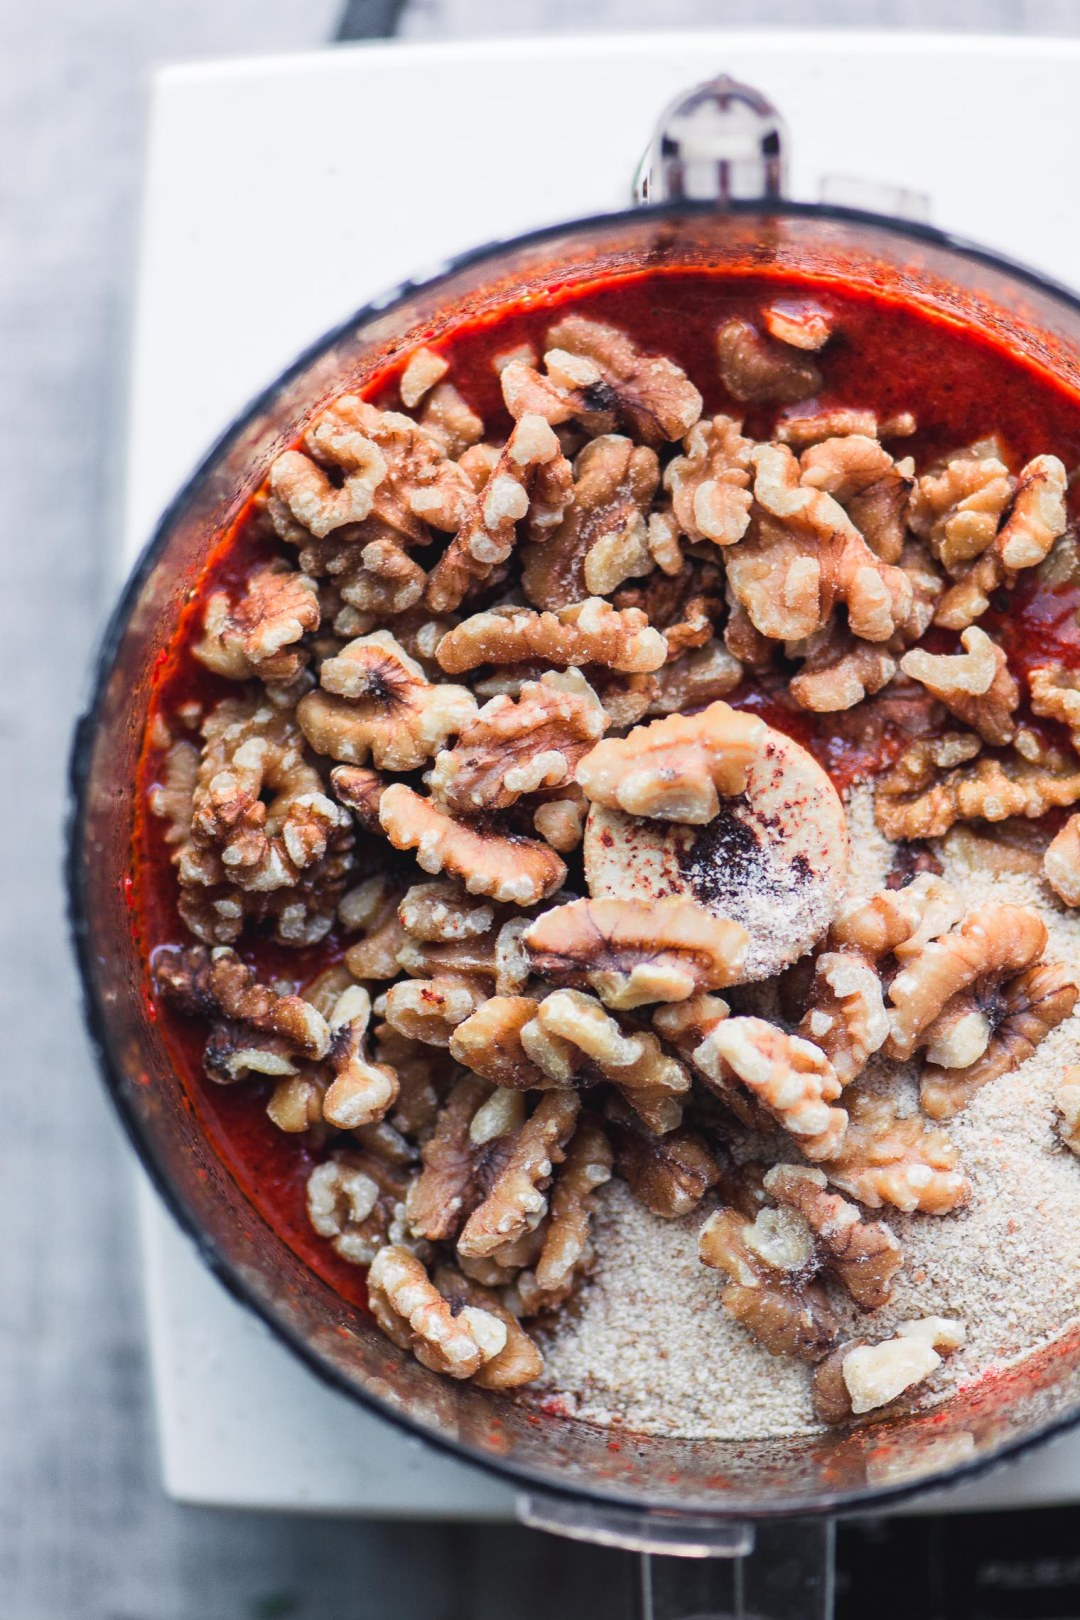 Making Syrian Muhammara roasted red pepper dip